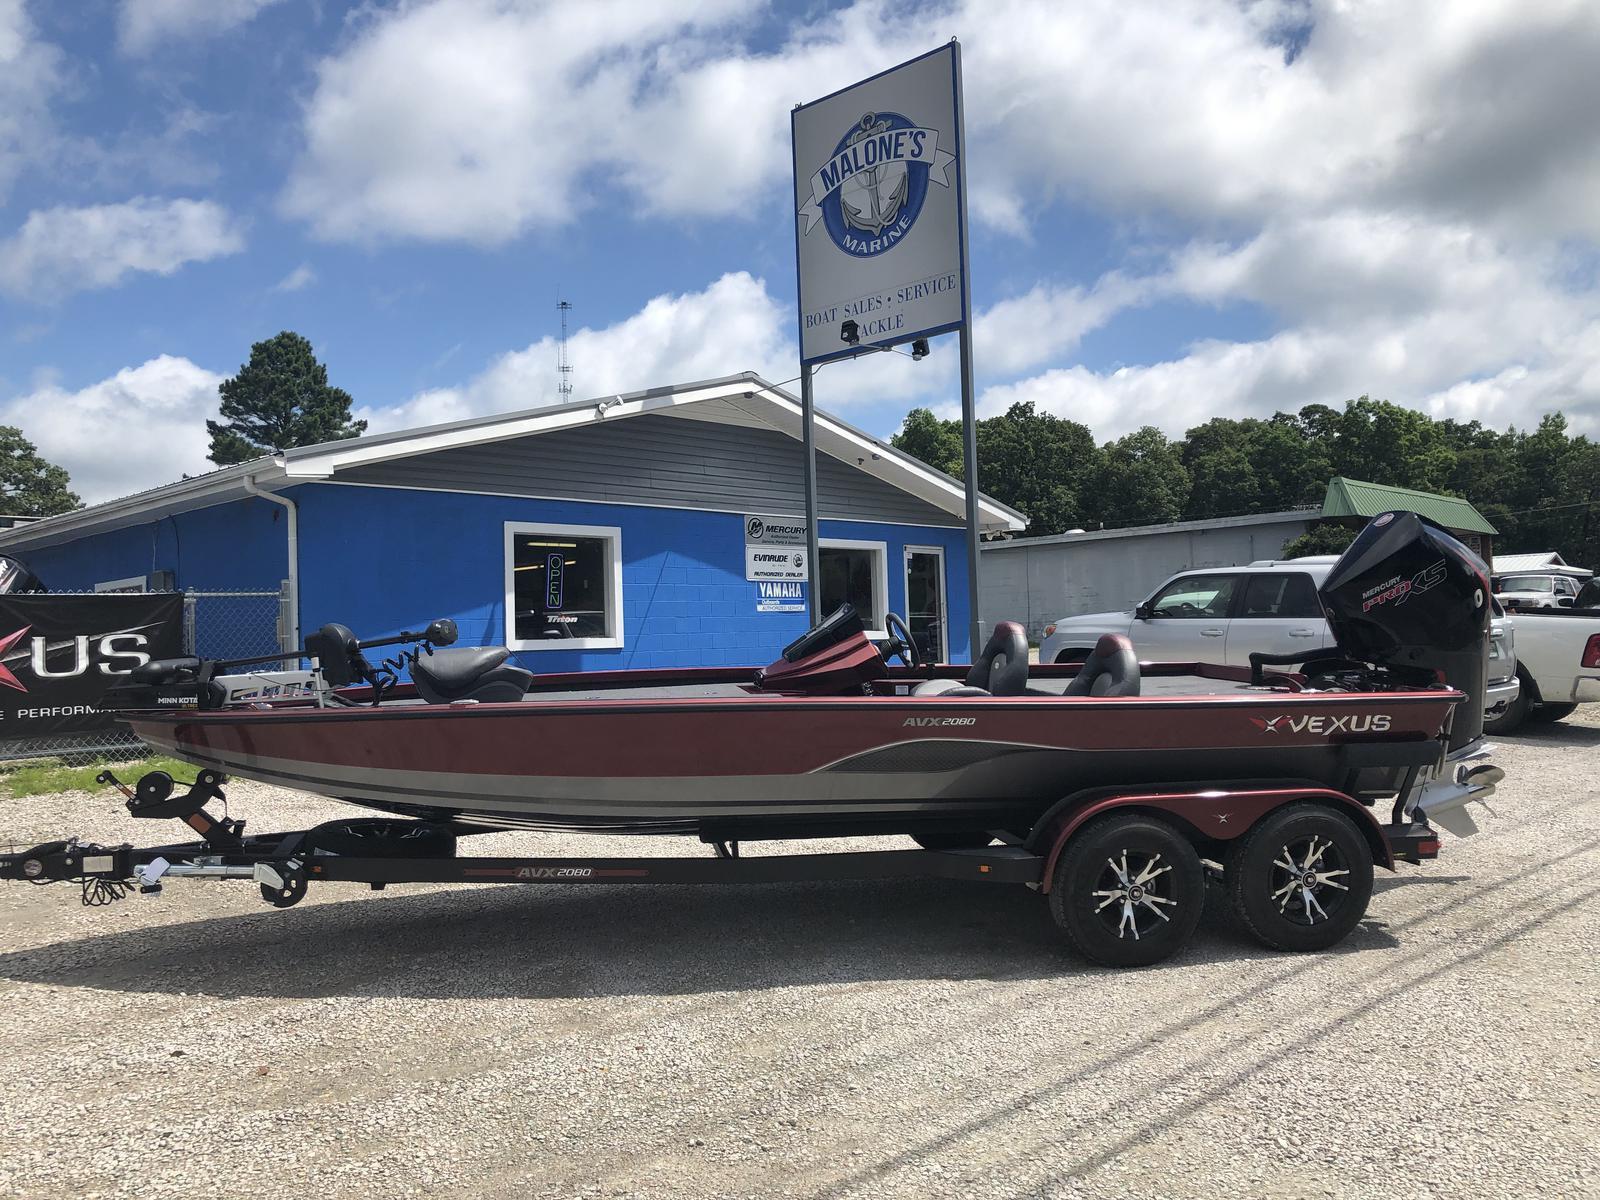 Inventory Malone's Marine Buchanan, TN (731) 642-9222